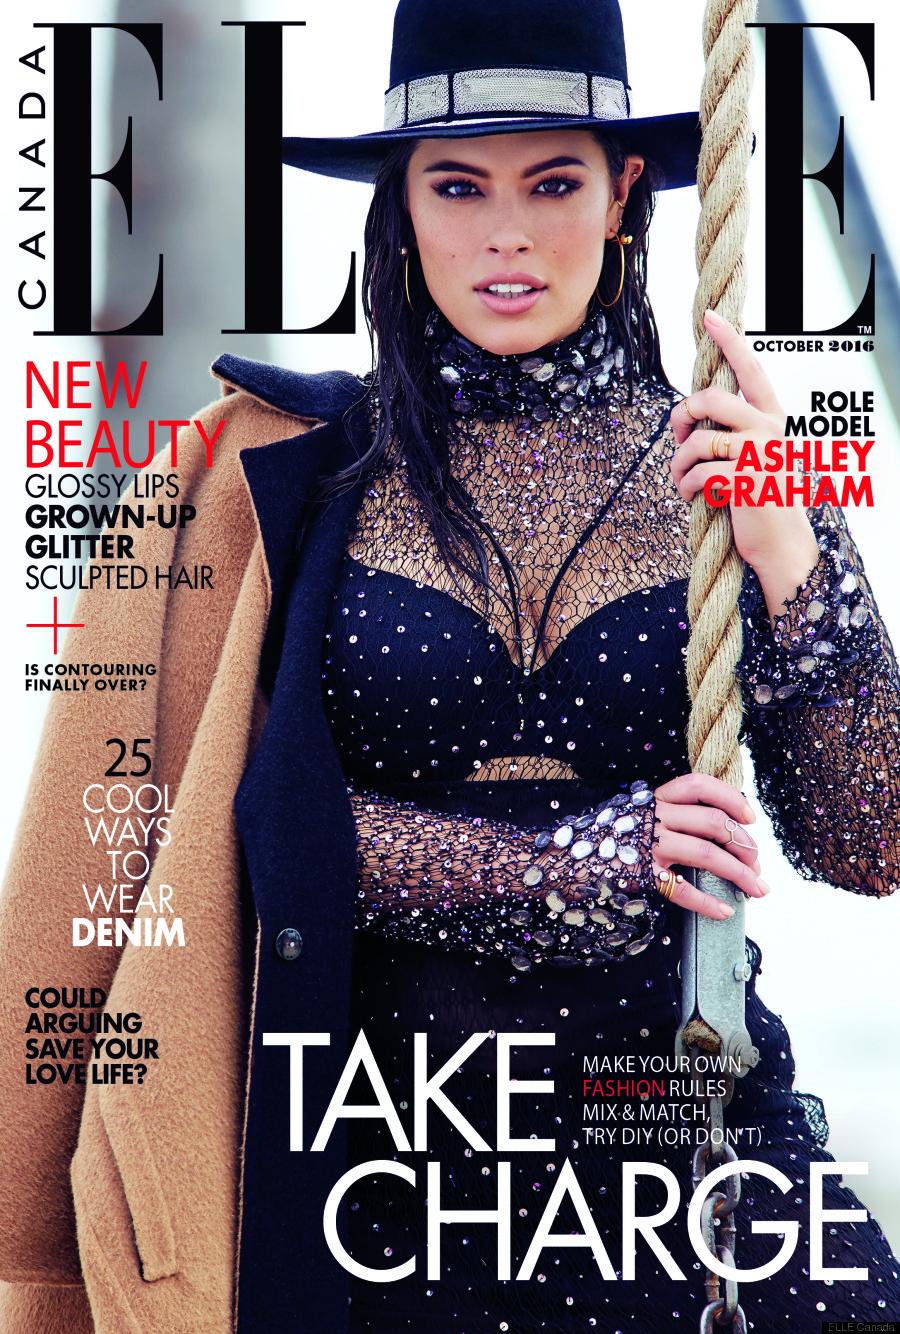 Ashley Graham - sophie theallet - ELLE CANADA cover October 2016.jpg